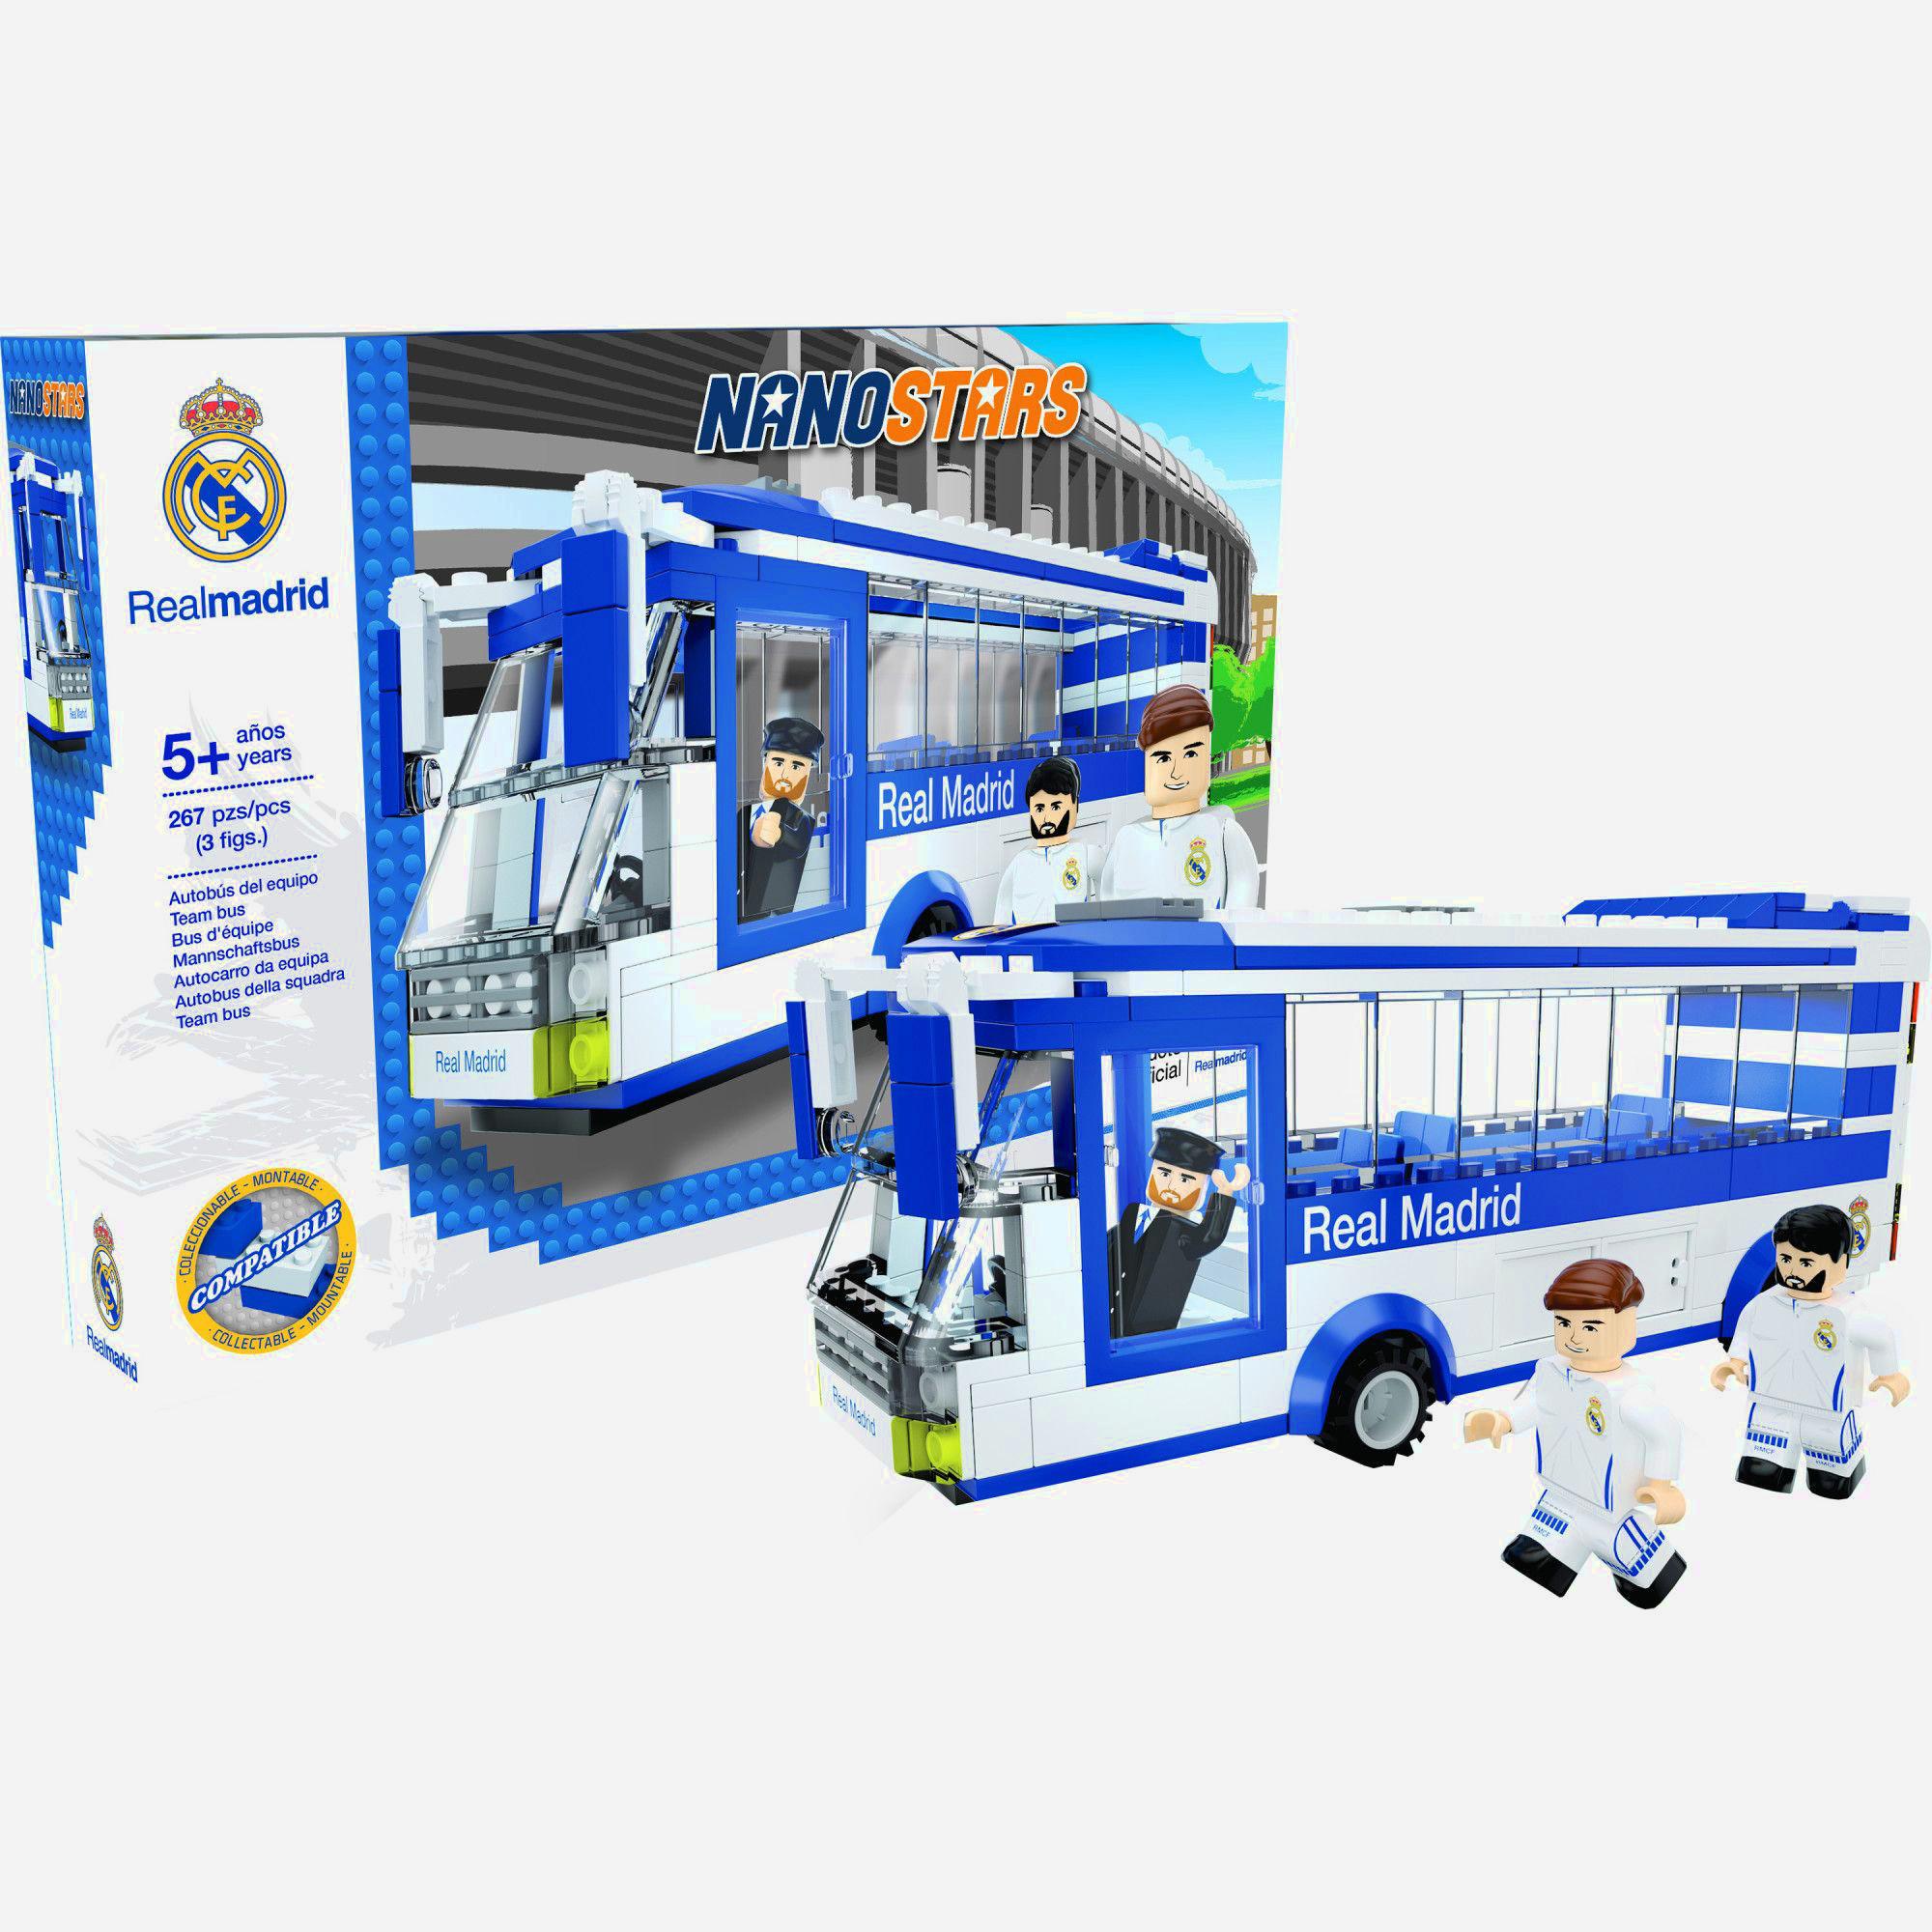 Real Madrid Nanostars Teambus